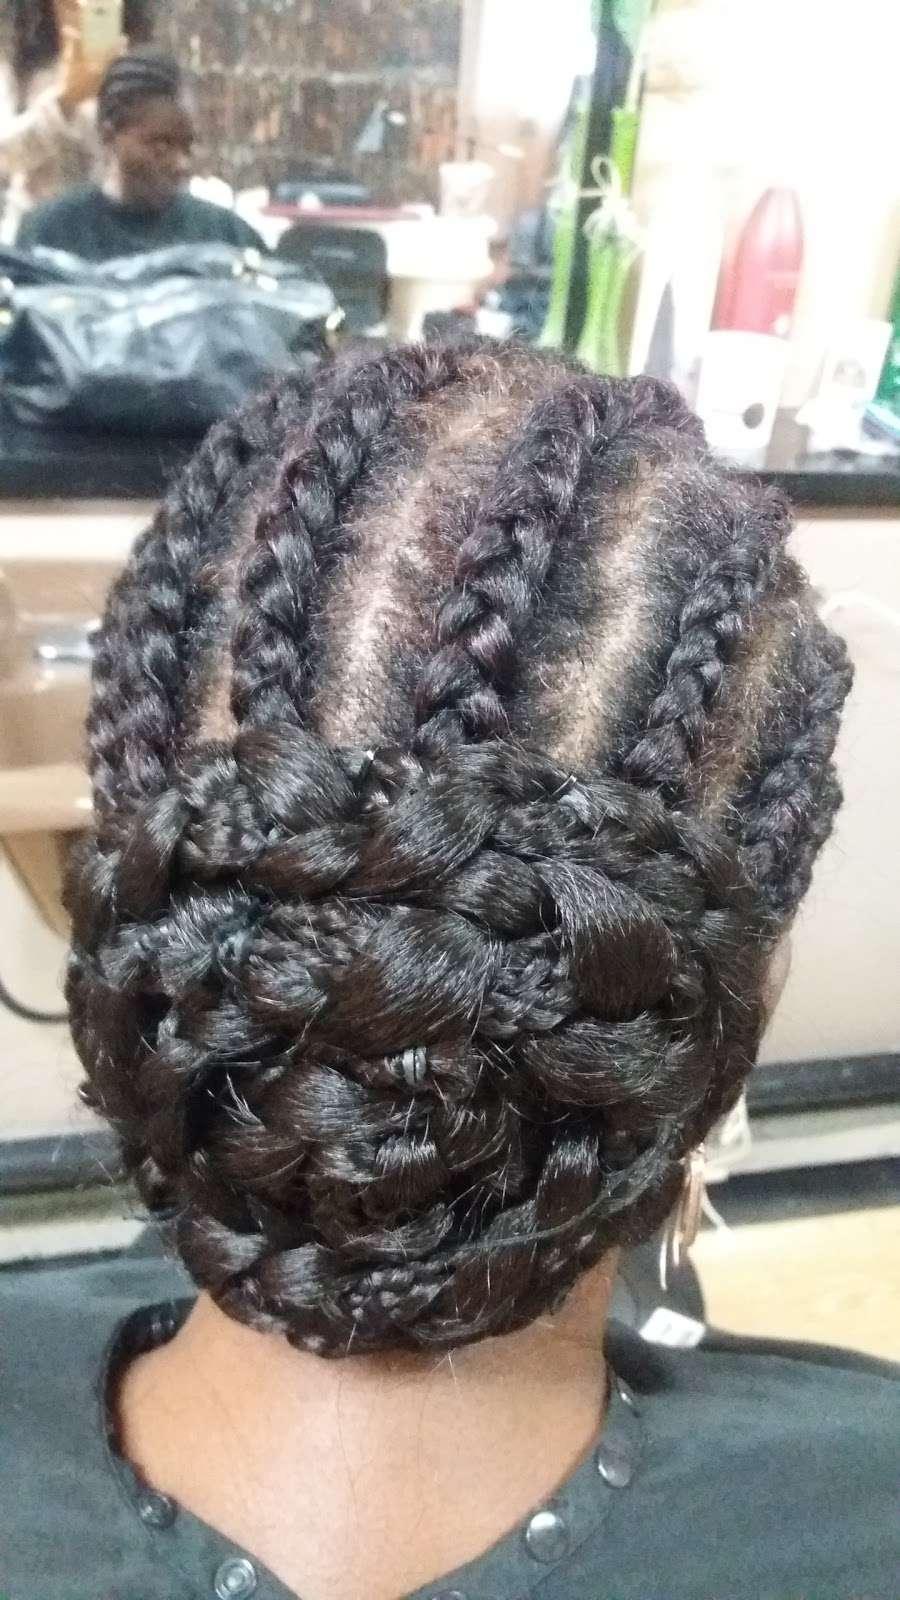 Dangela Beauty Salon - hair care  | Photo 8 of 10 | Address: 80 N Sussex St, Dover, NJ 07801, USA | Phone: (973) 978-7256